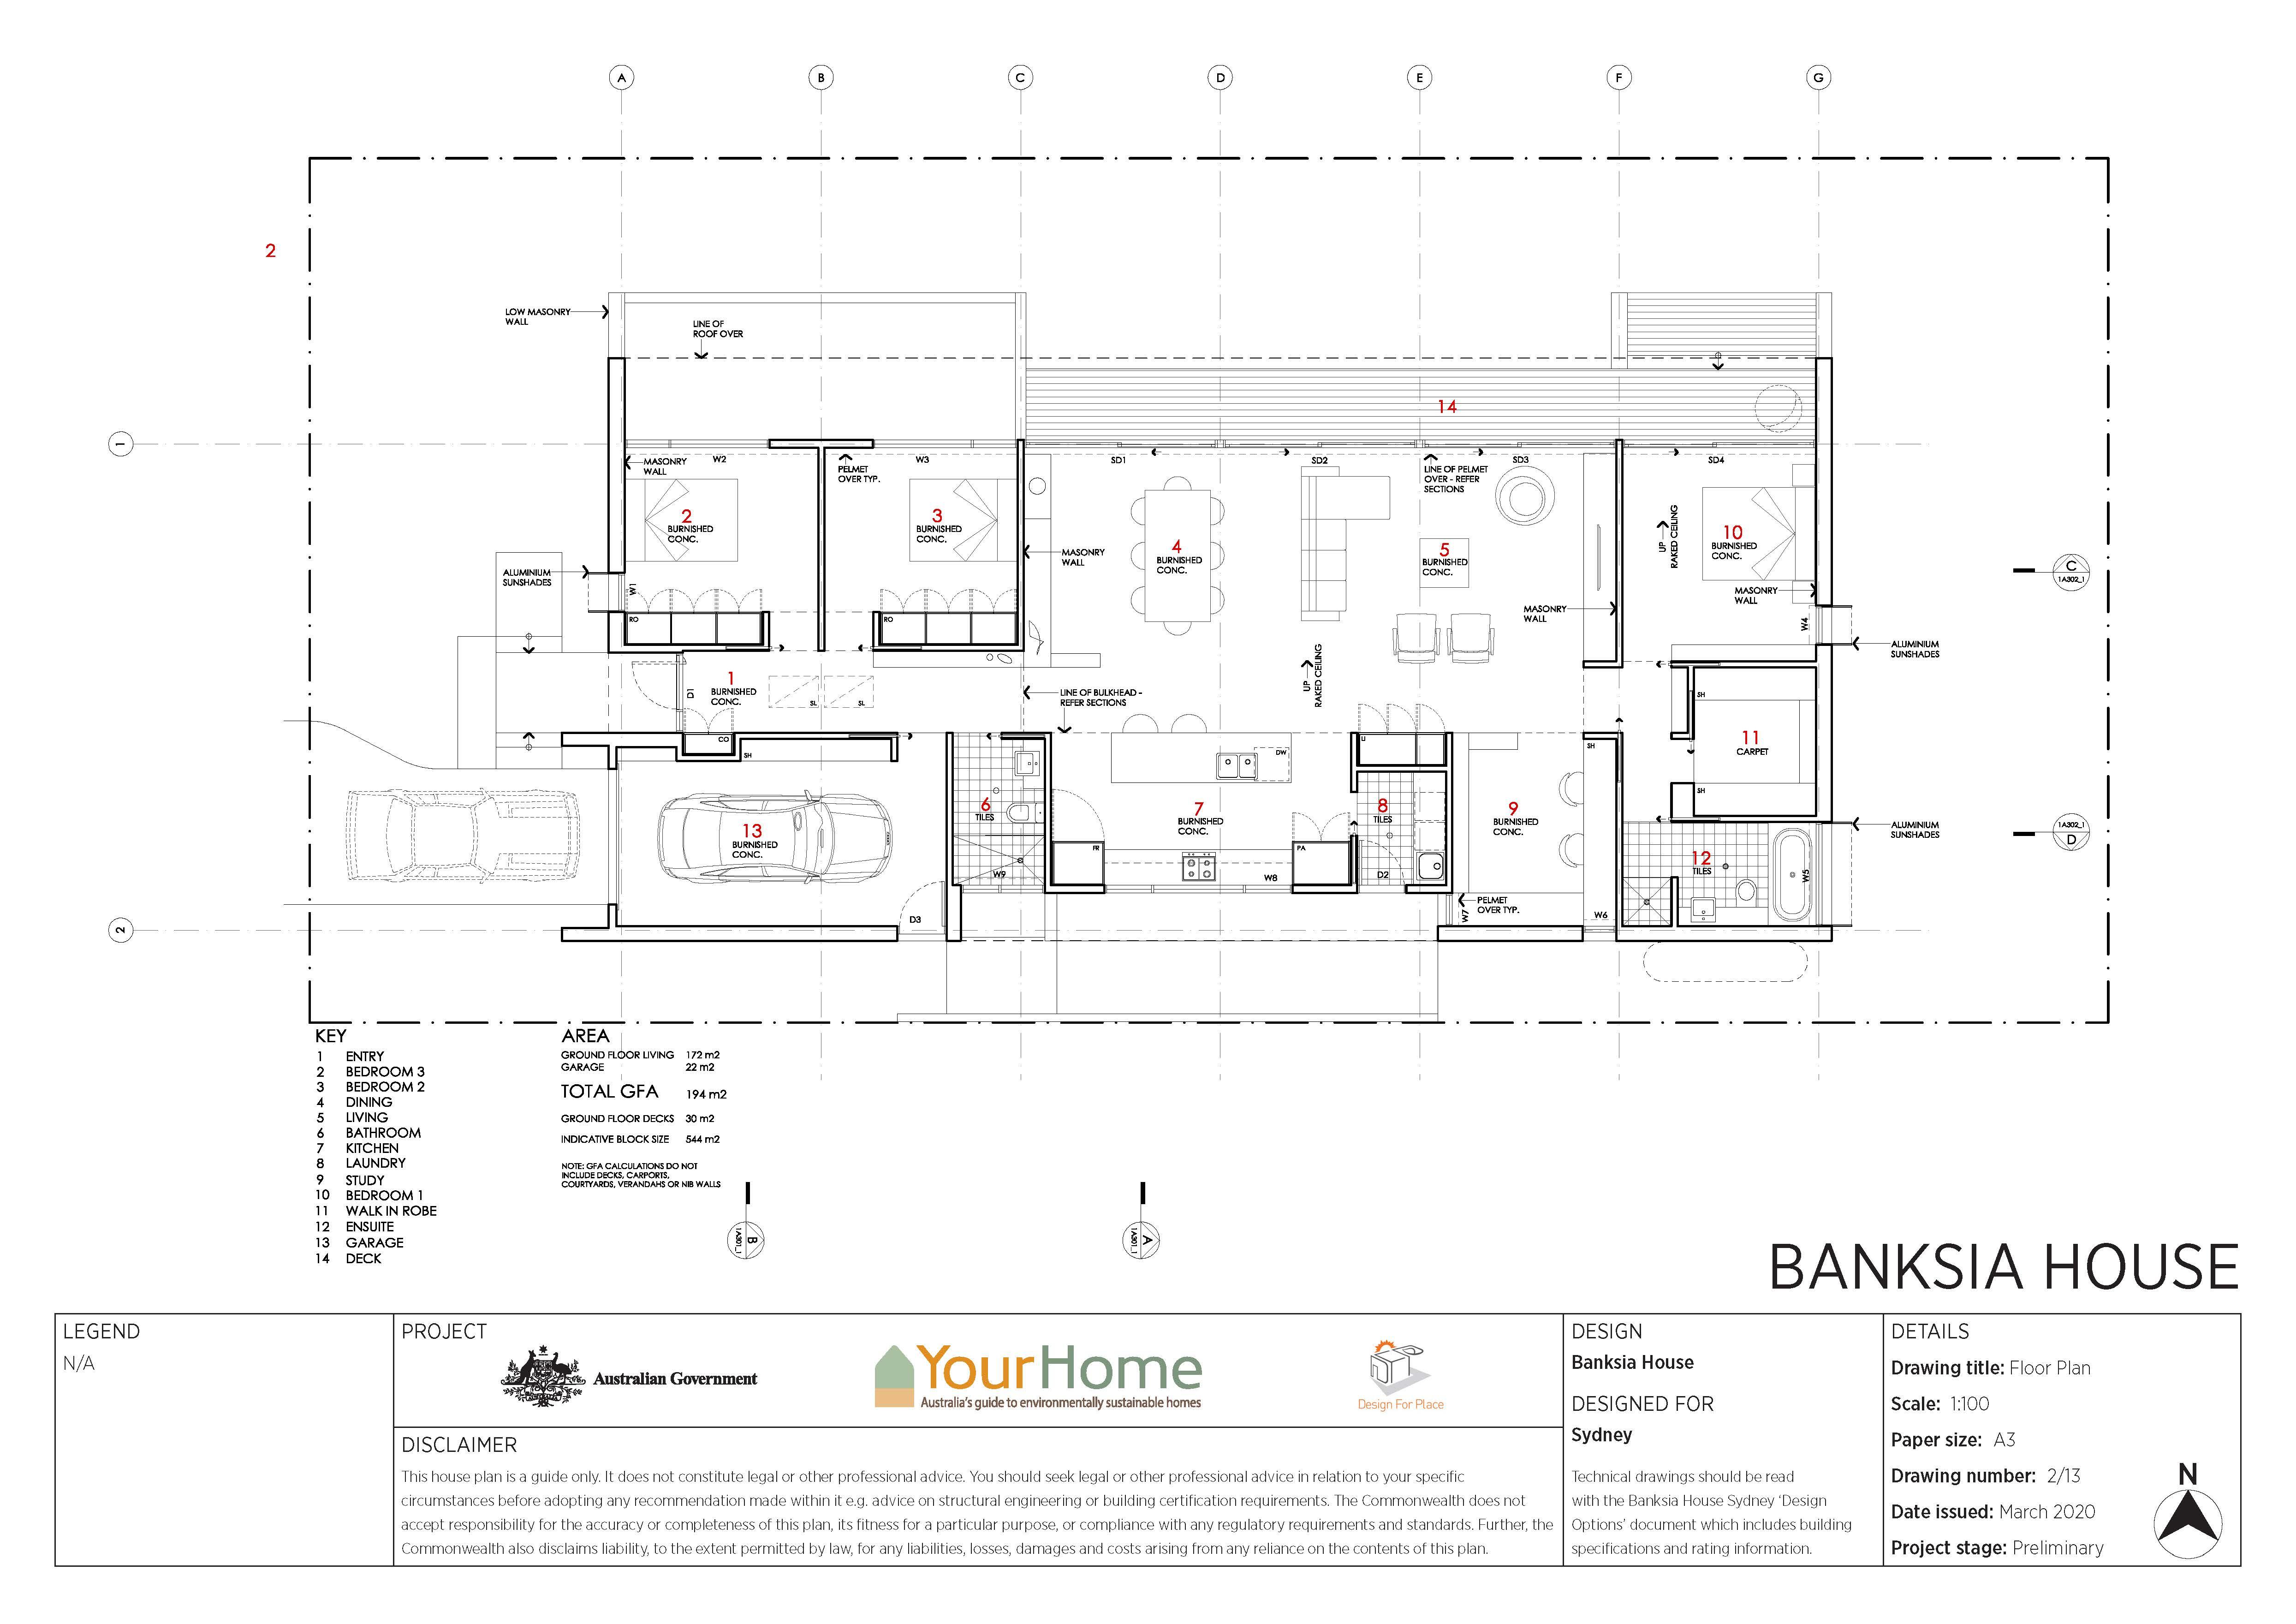 BANKSIA HOUSE